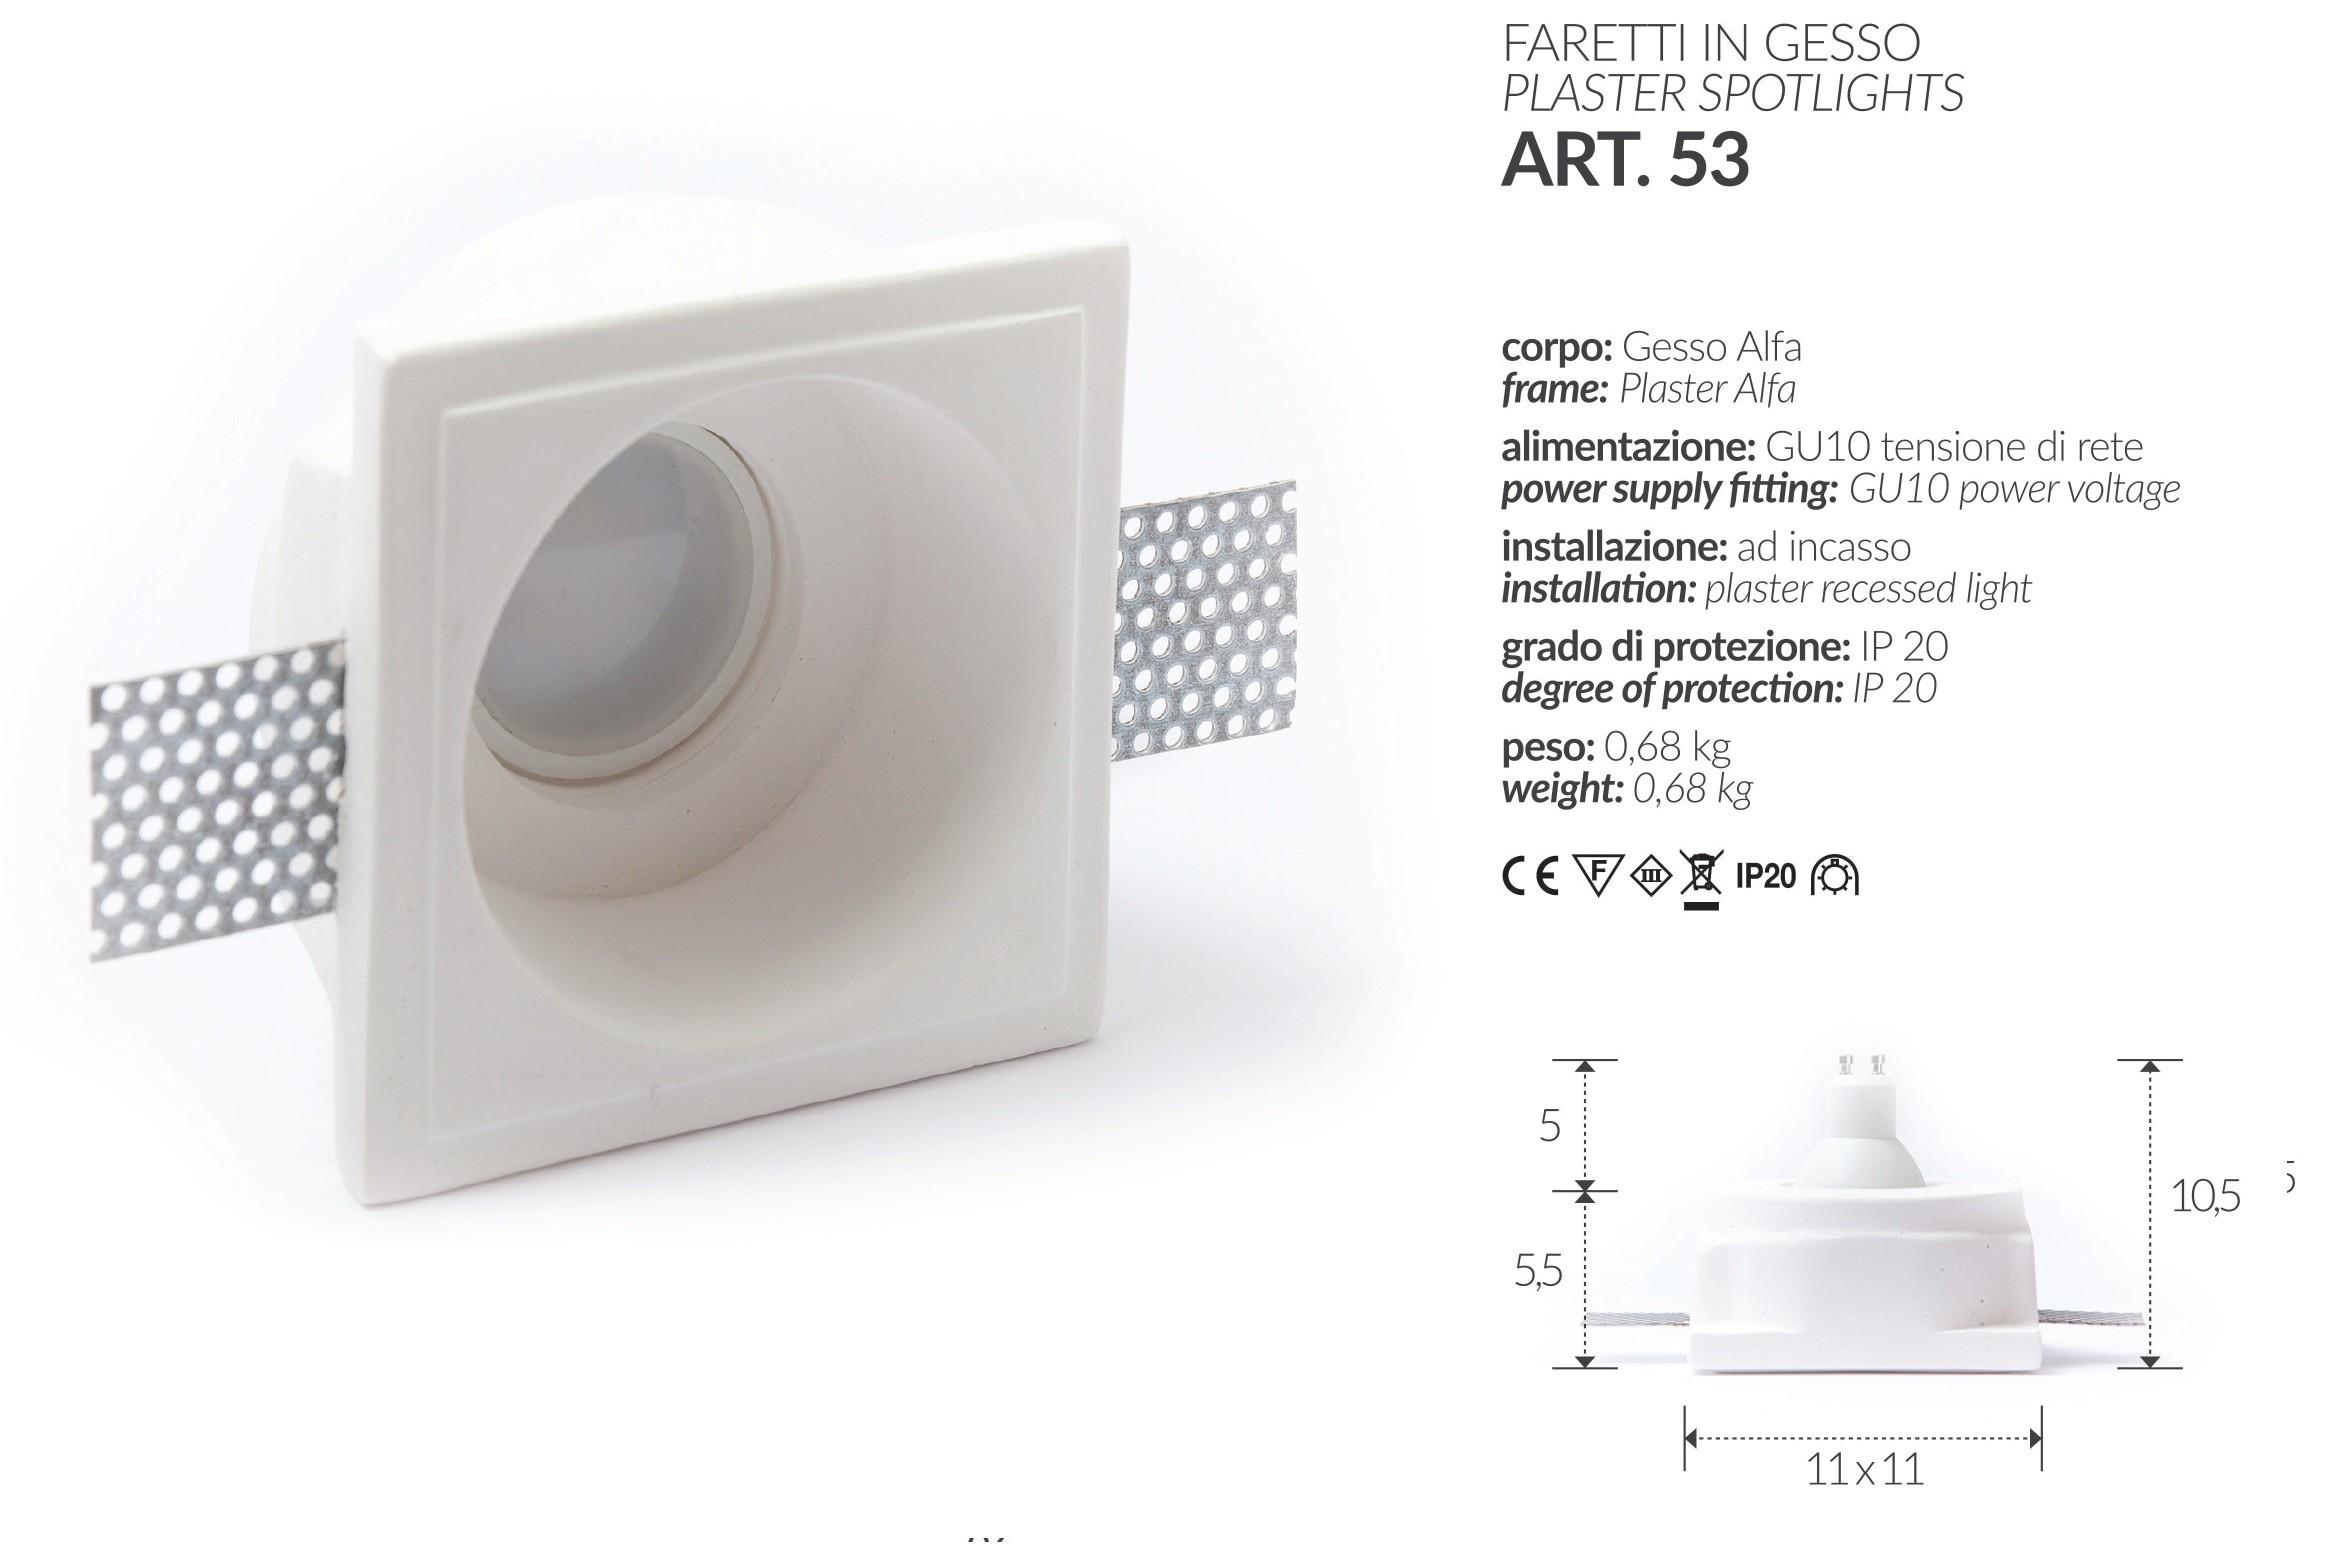 LED-EINBAULEUCHTE IN GIPS QUADRAT, UNTEN, ART.1 MIS. cm.12X12x2.5